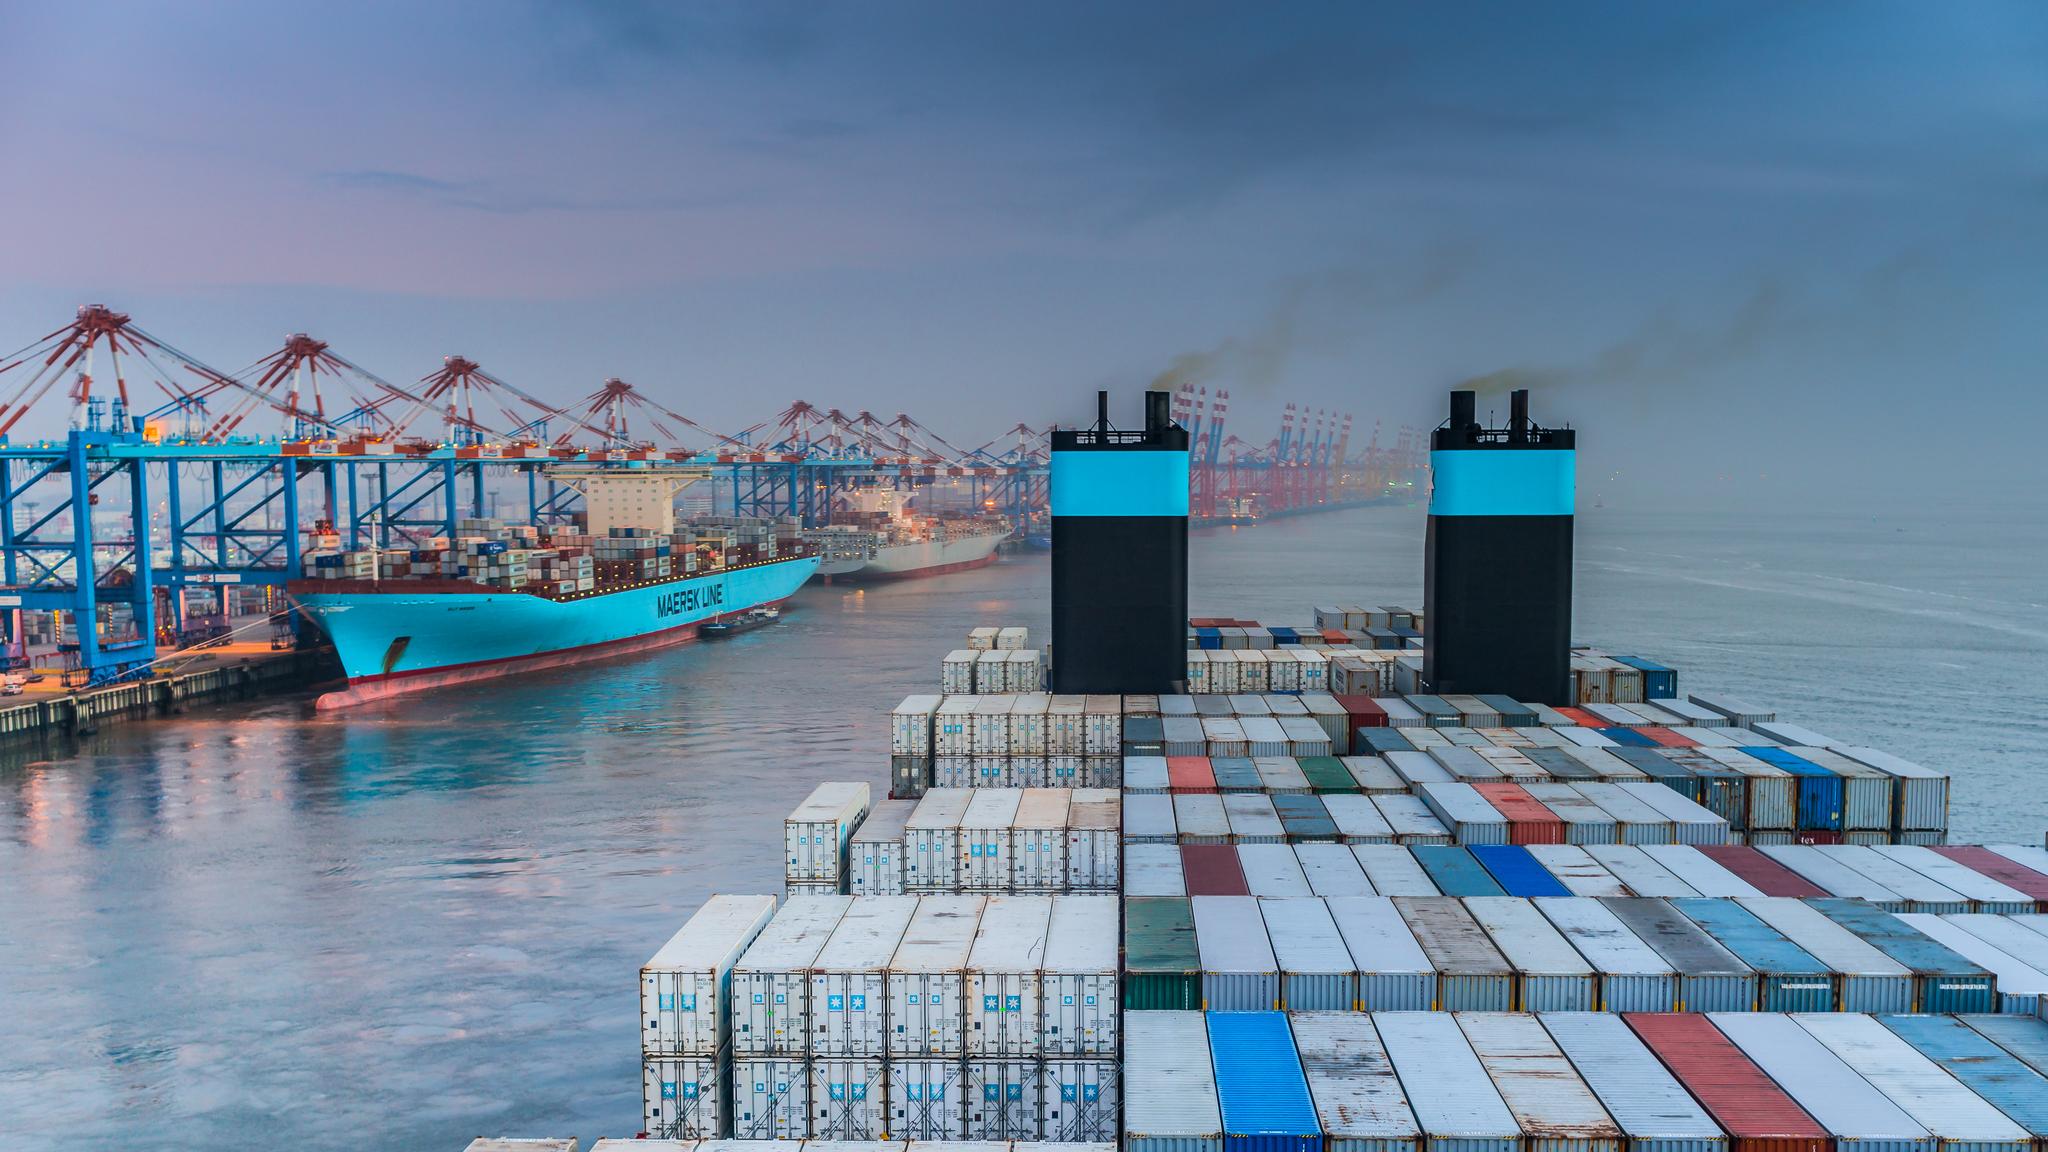 Mayview Maersk odbija od nabrzeża w Bremerhaven, w tle kontenerowce Elly Maersk i Seago Istanbul (fot. Robert Urbaniak)